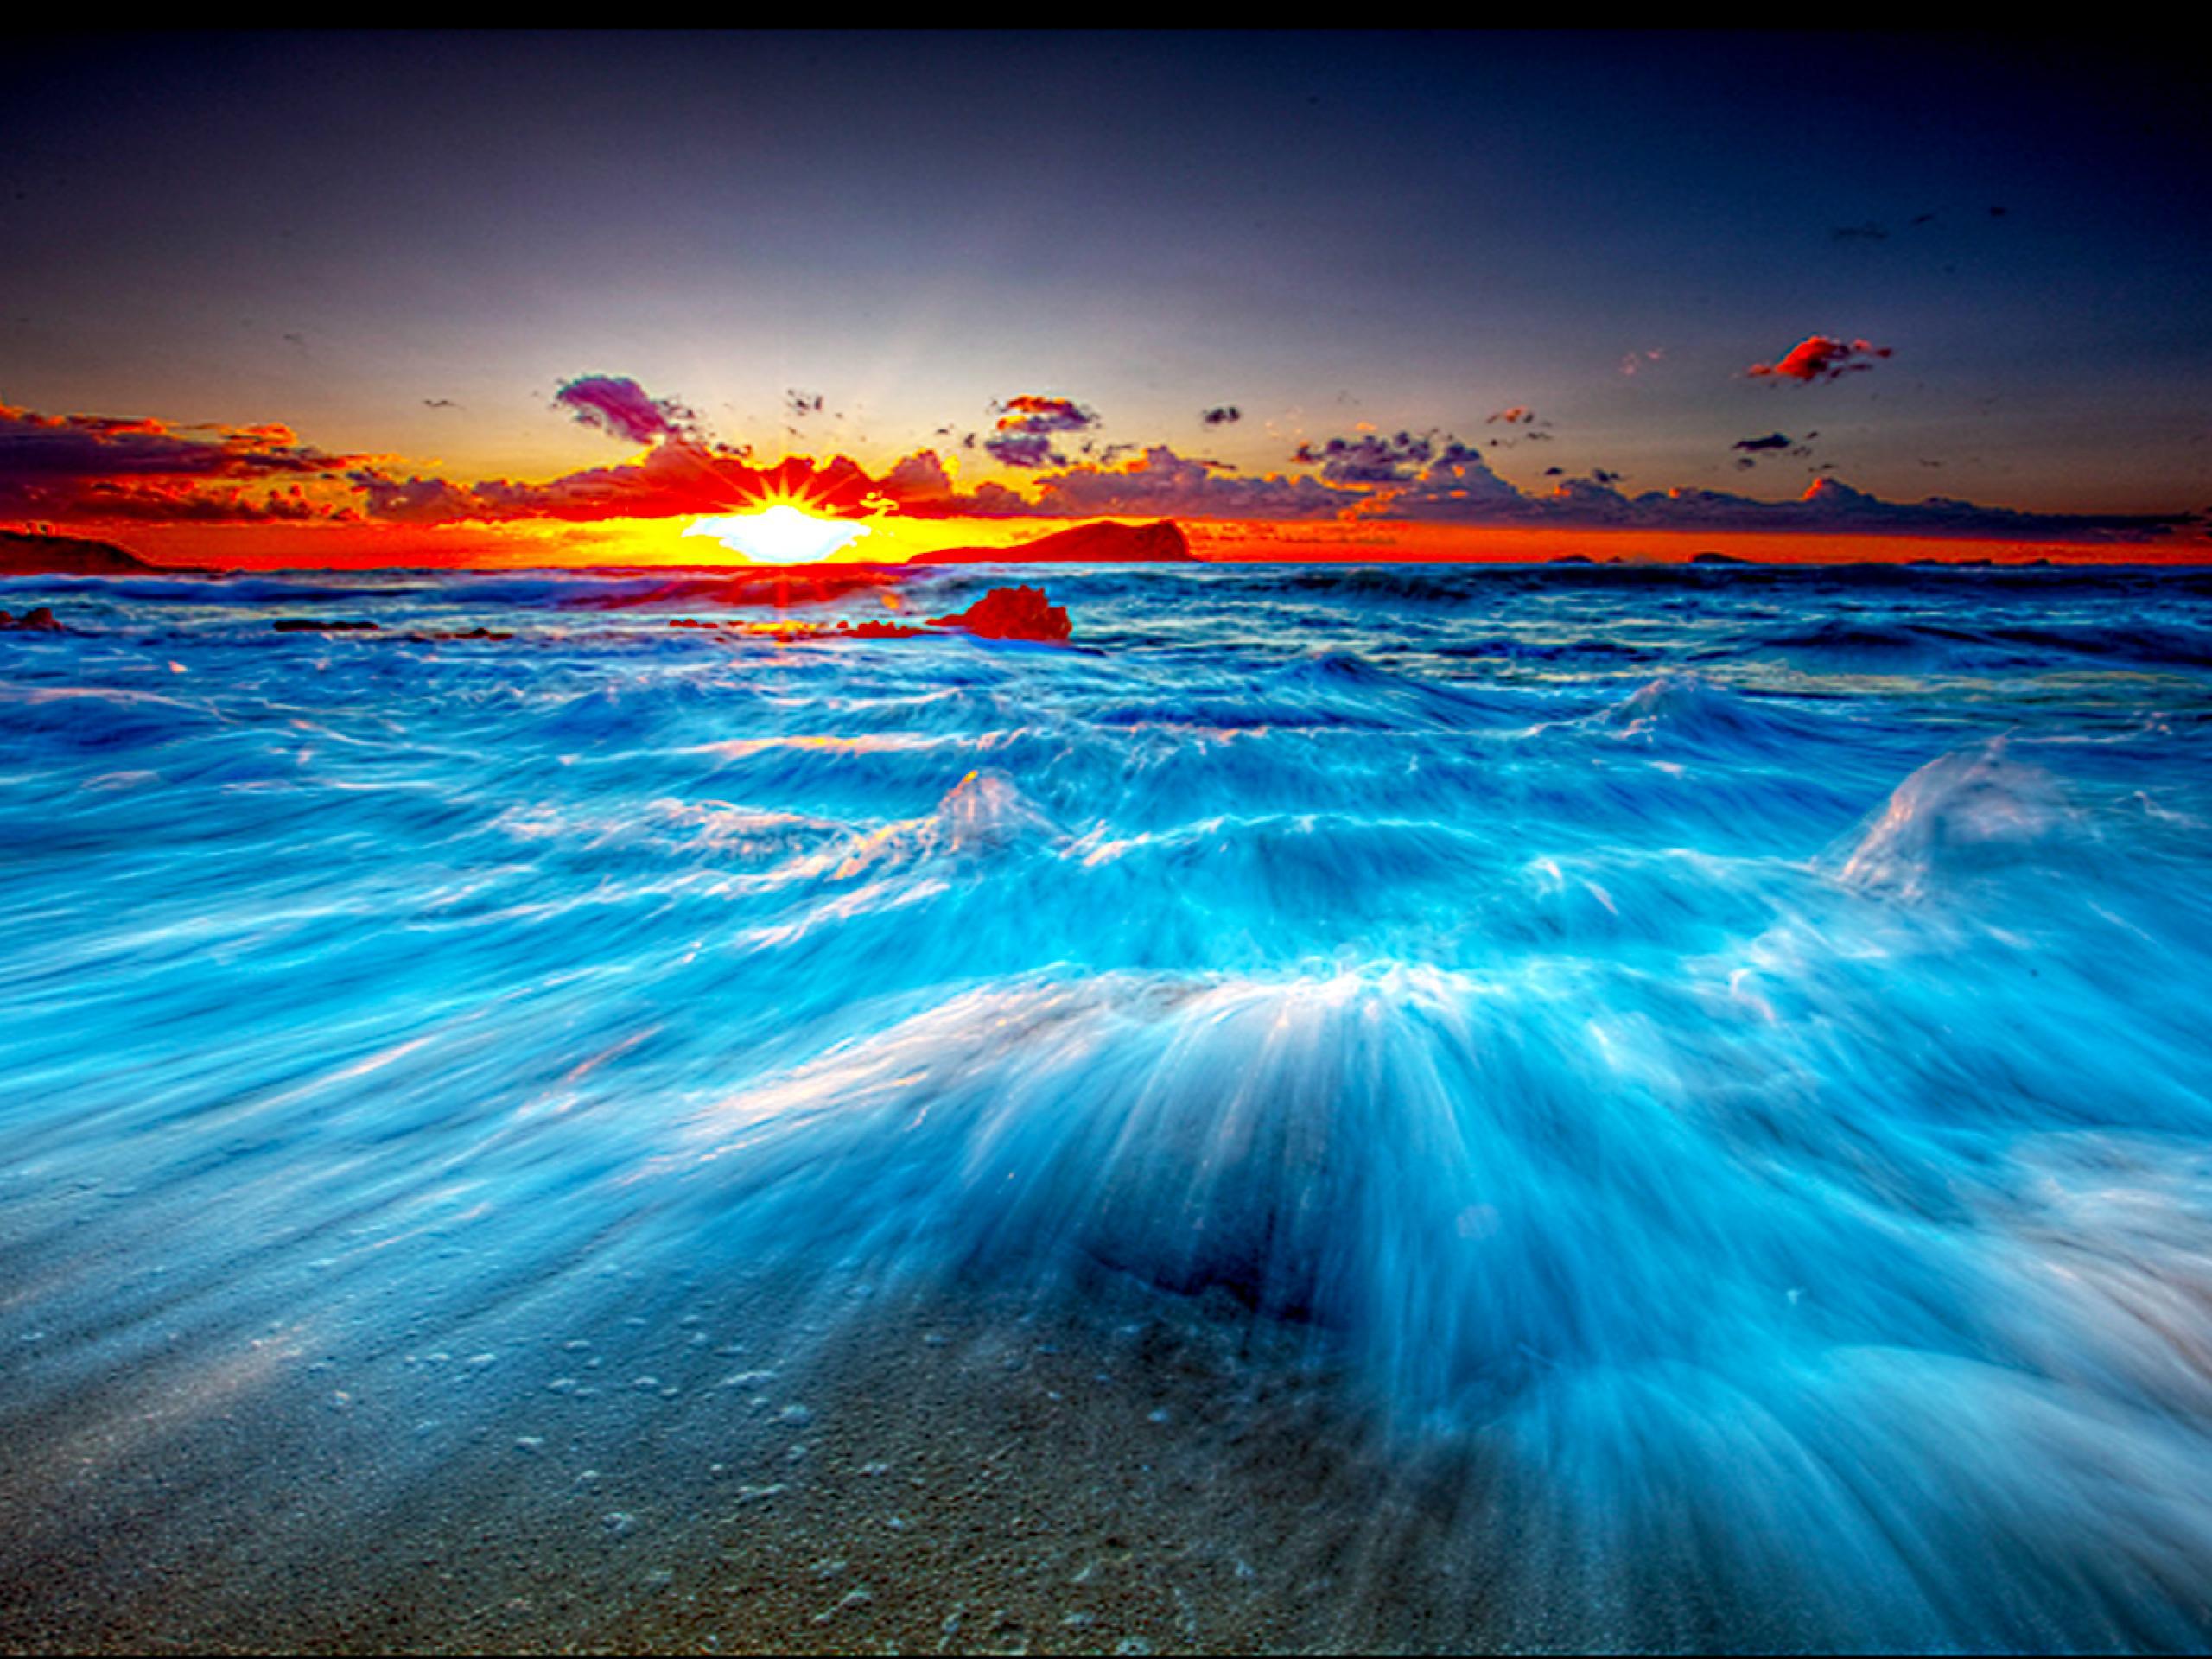 Desktop Photo Background Wave Backgrounds Ocean Wallpapers - Beach Waves Background Hd - HD Wallpaper